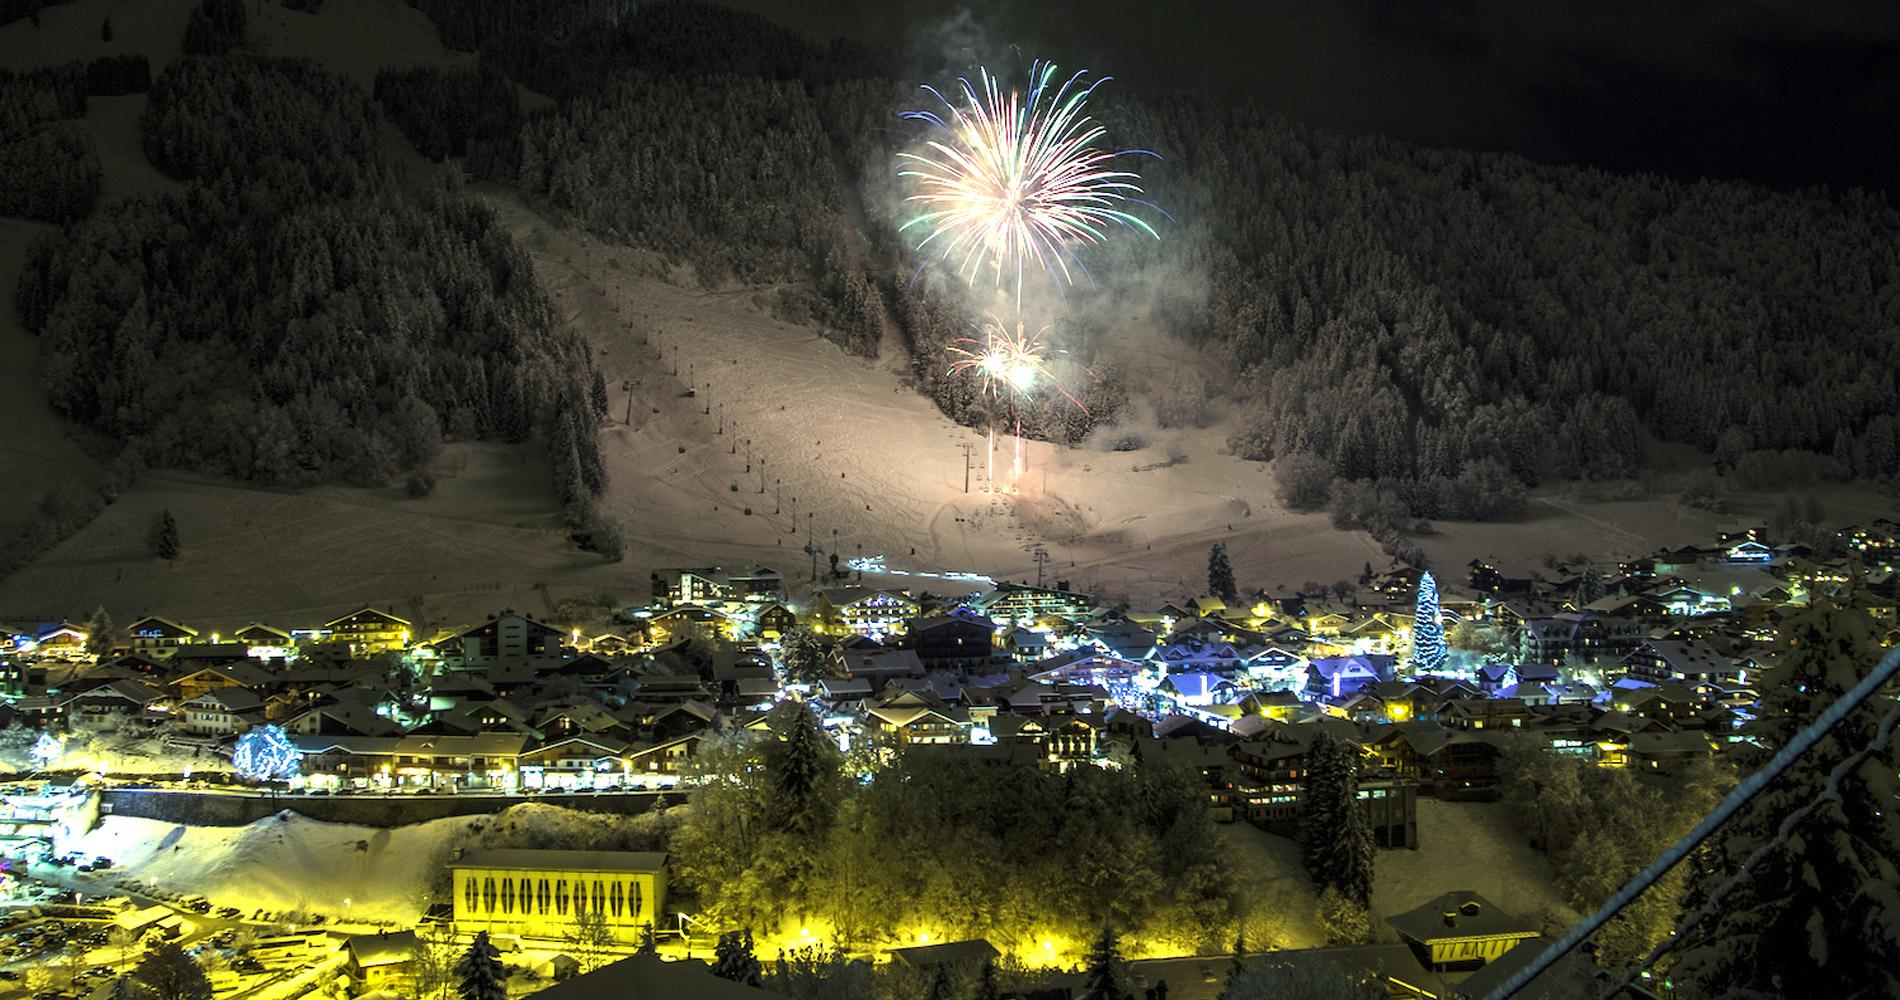 Morzine town winter fireworks